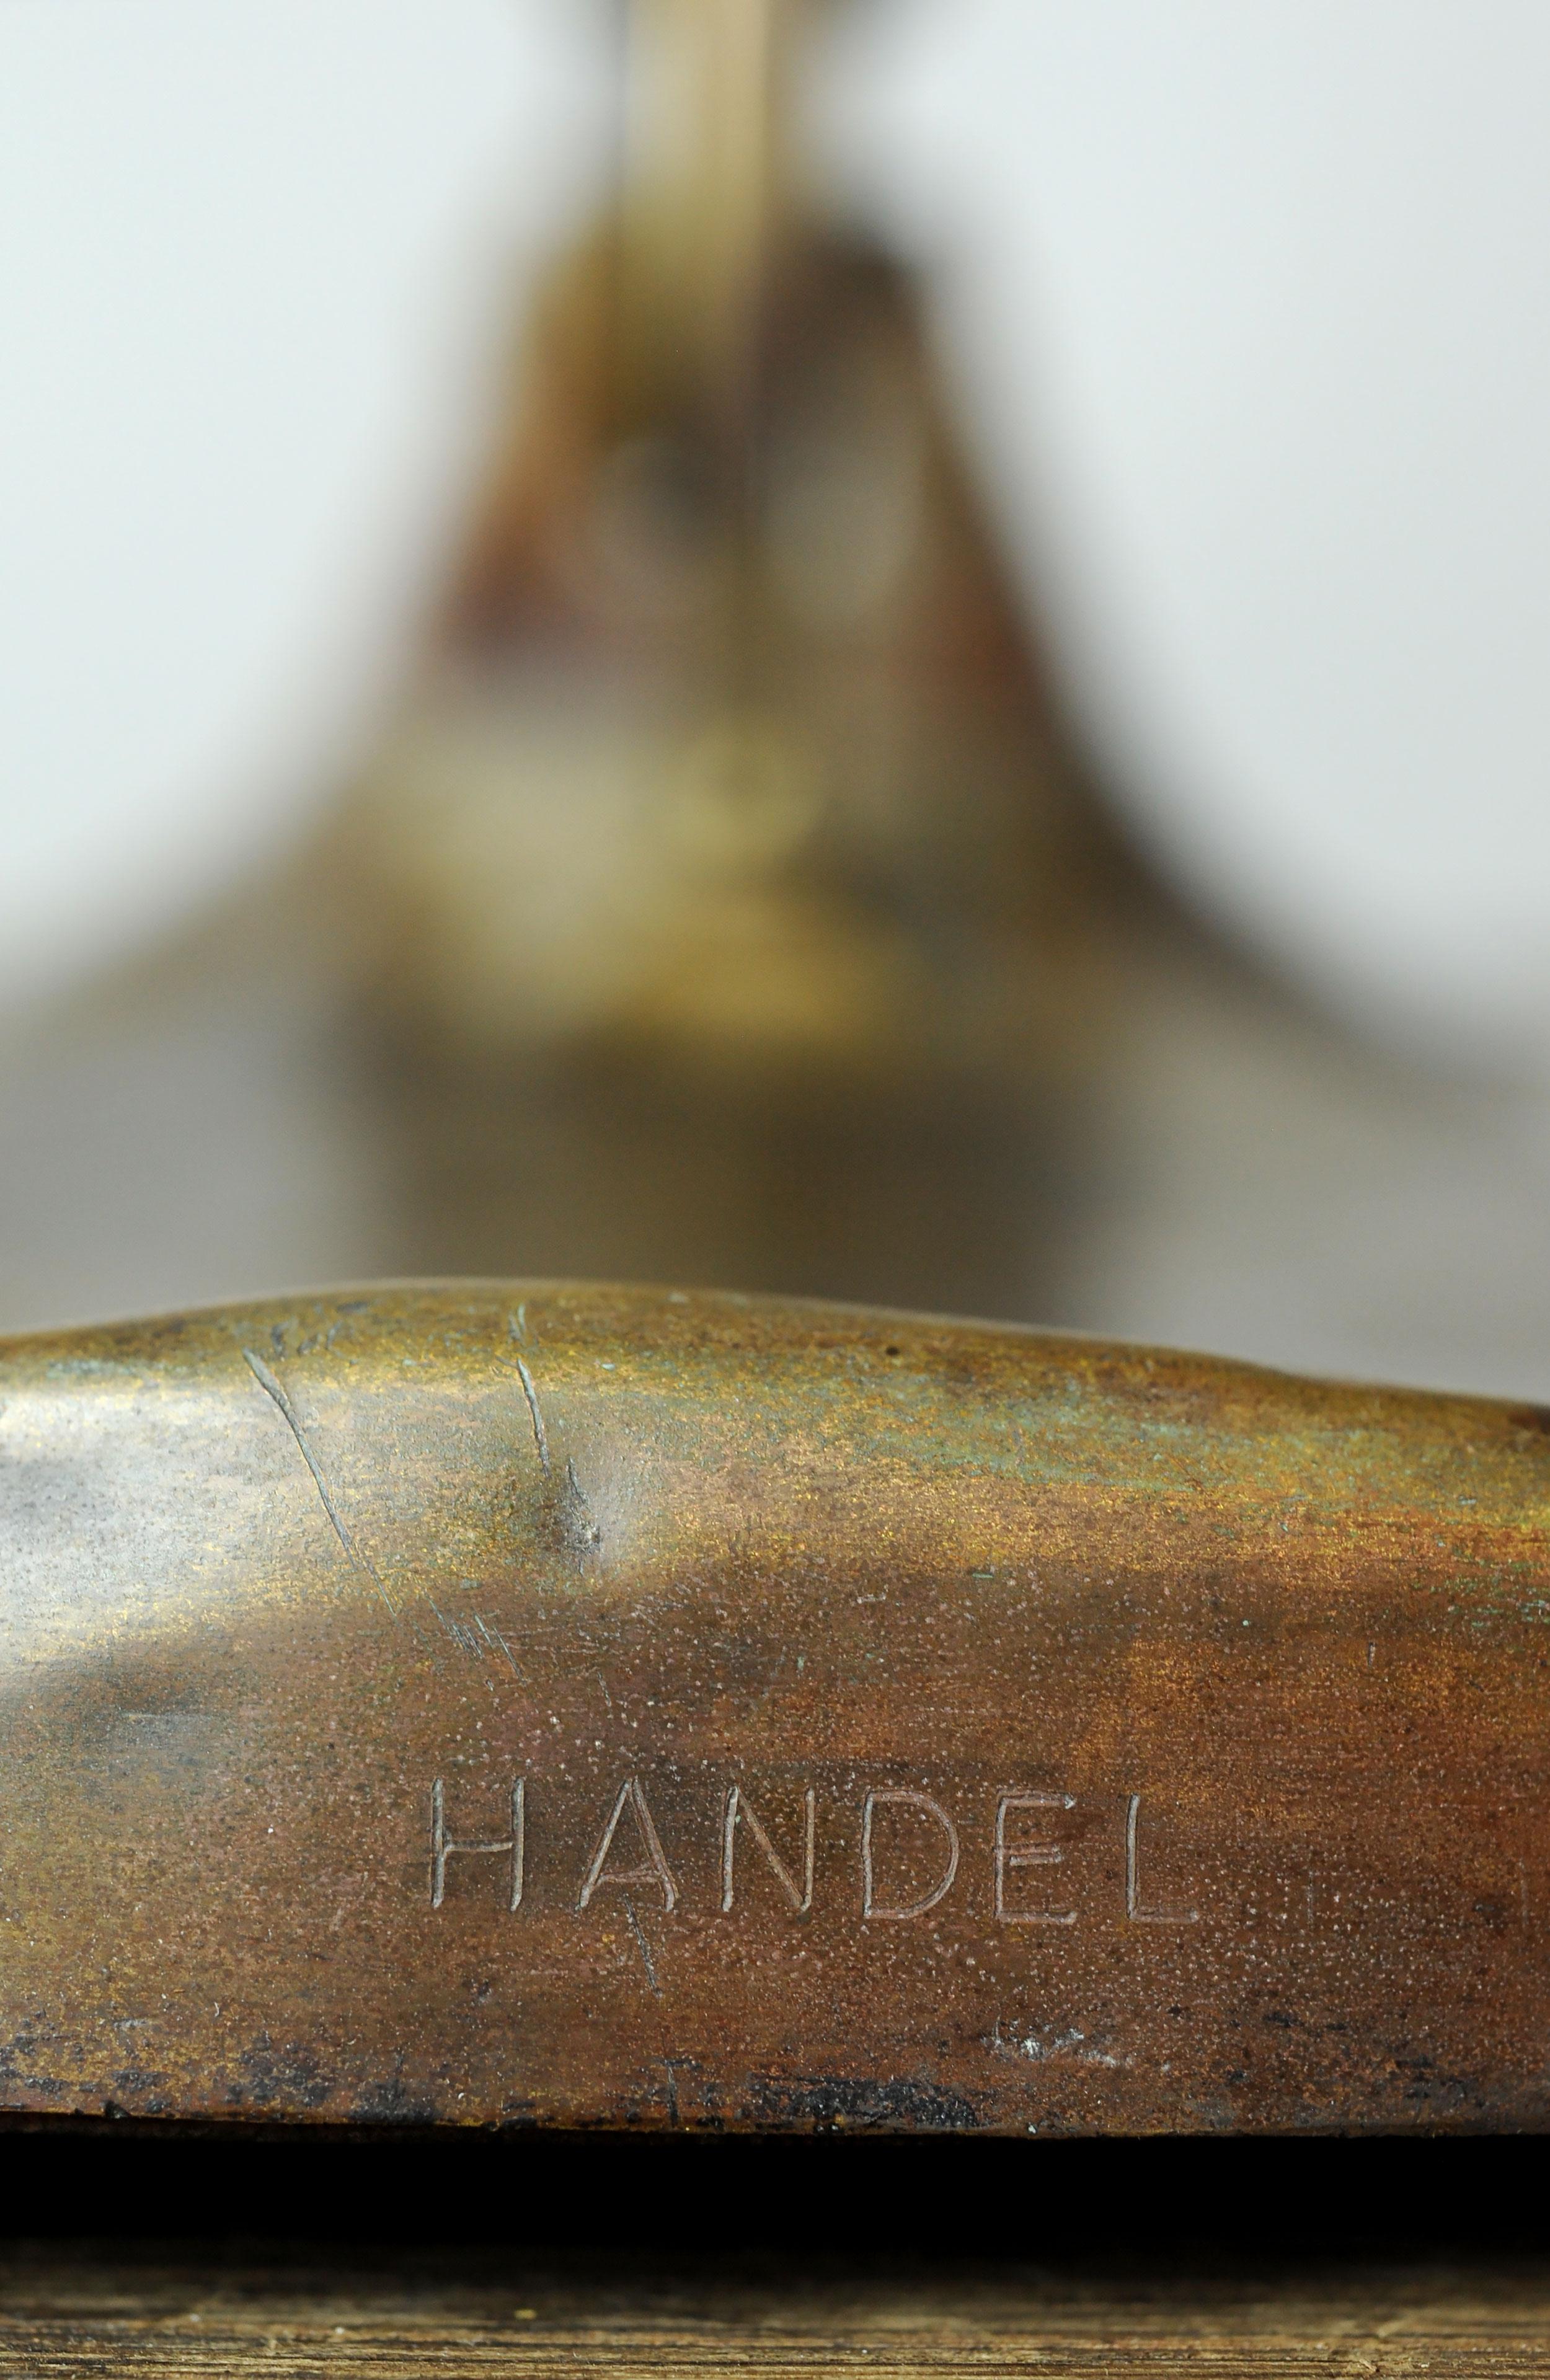 47195-handel-table-lamp-makers-mark.jpg